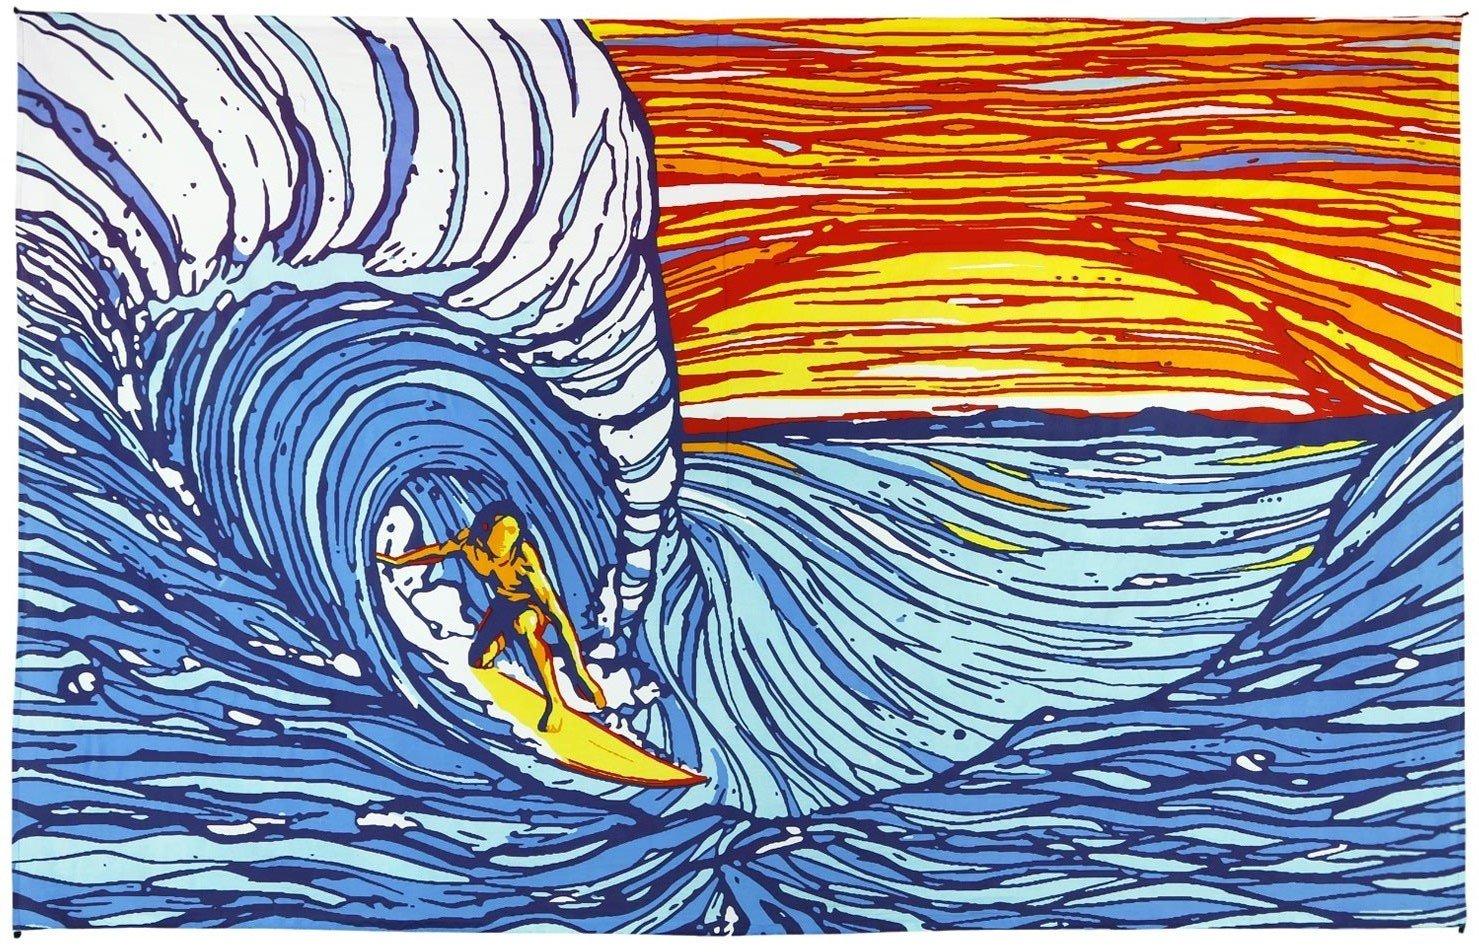 Sunshine Joy Sunset Surfer Ocean Wave Surf Tapestry Wall Hanging Huge 60x90 Inches